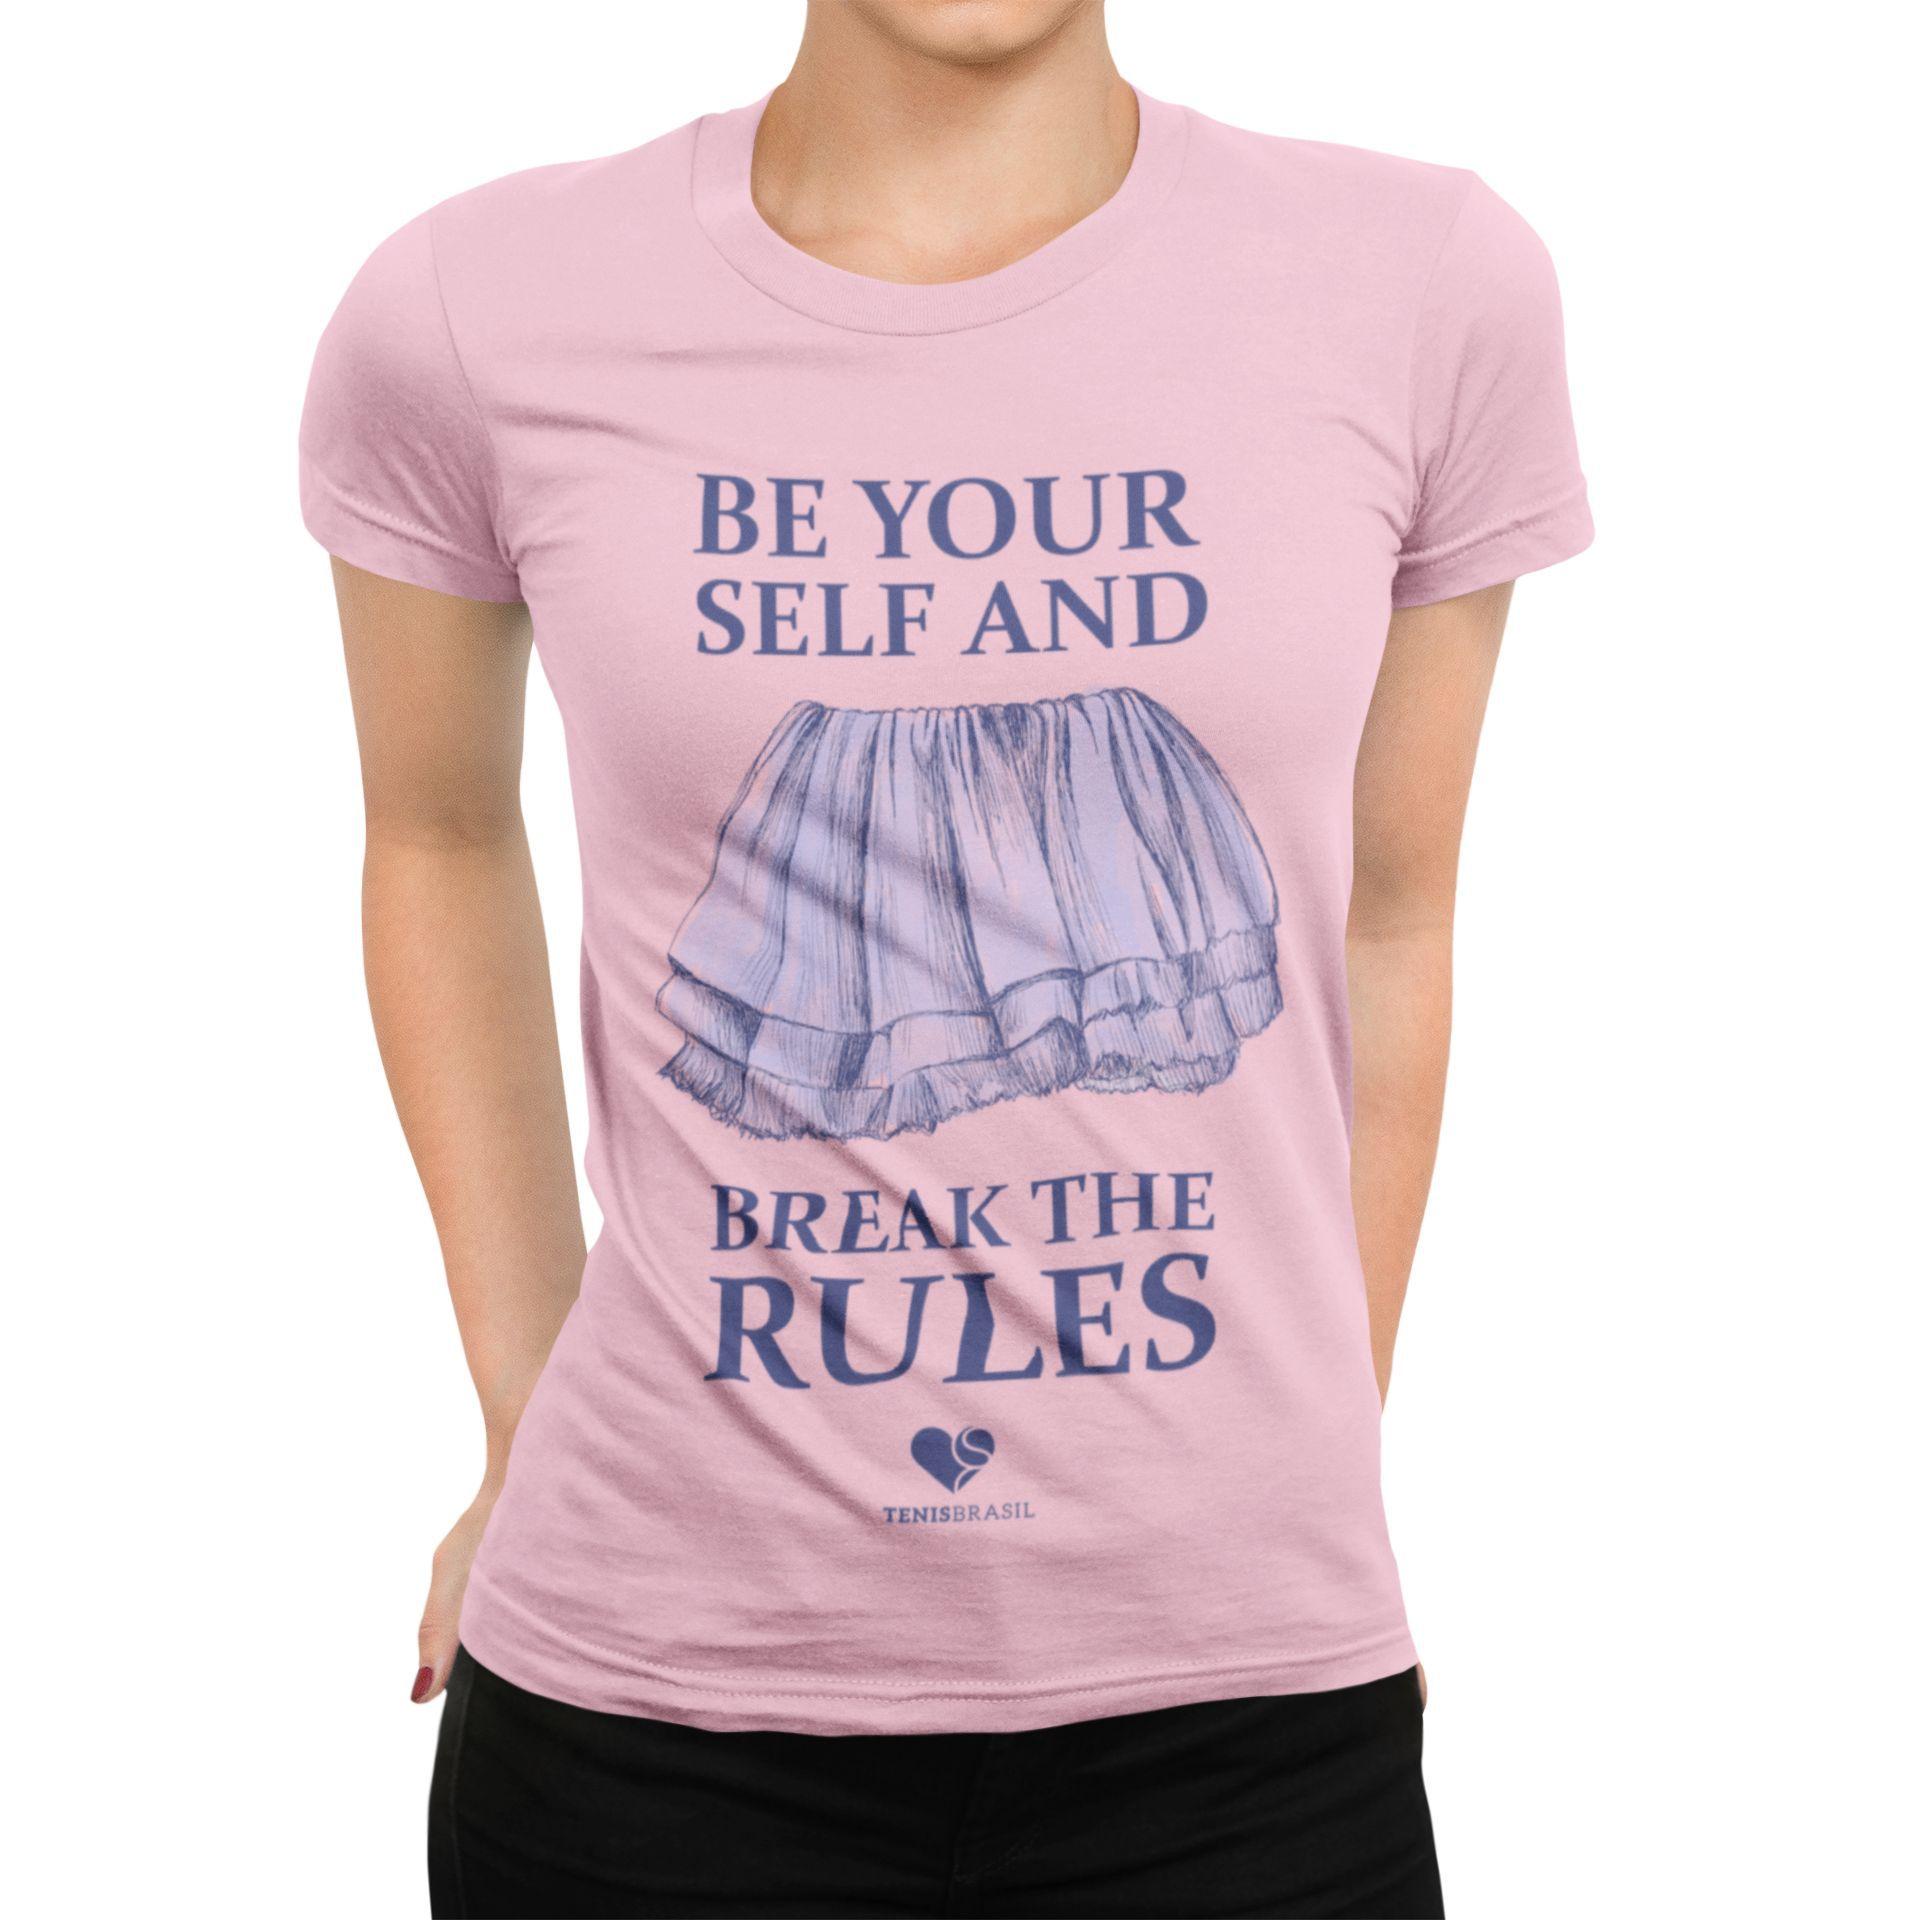 Camiseta BREAK THE RULES >> Coleção 2019 >> FEMININA